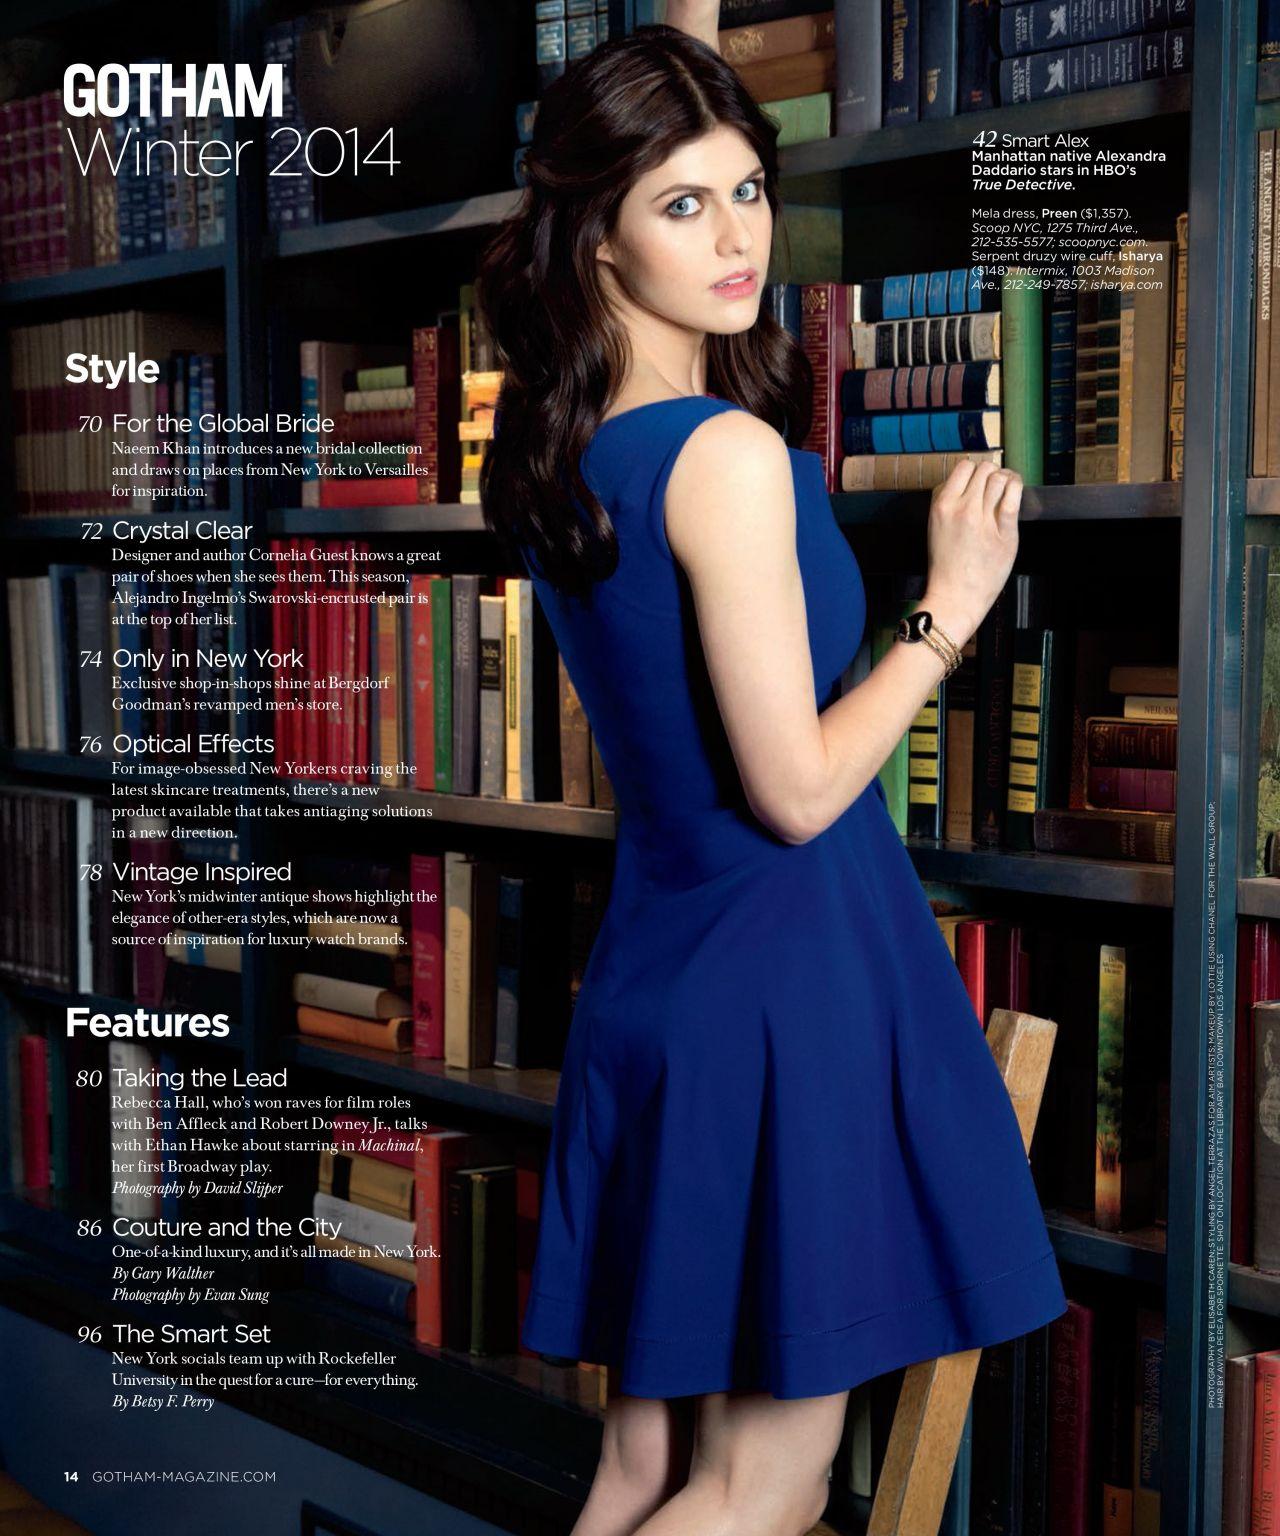 Alexandra Daddario - GOTHAM Magazine - Winter 2014